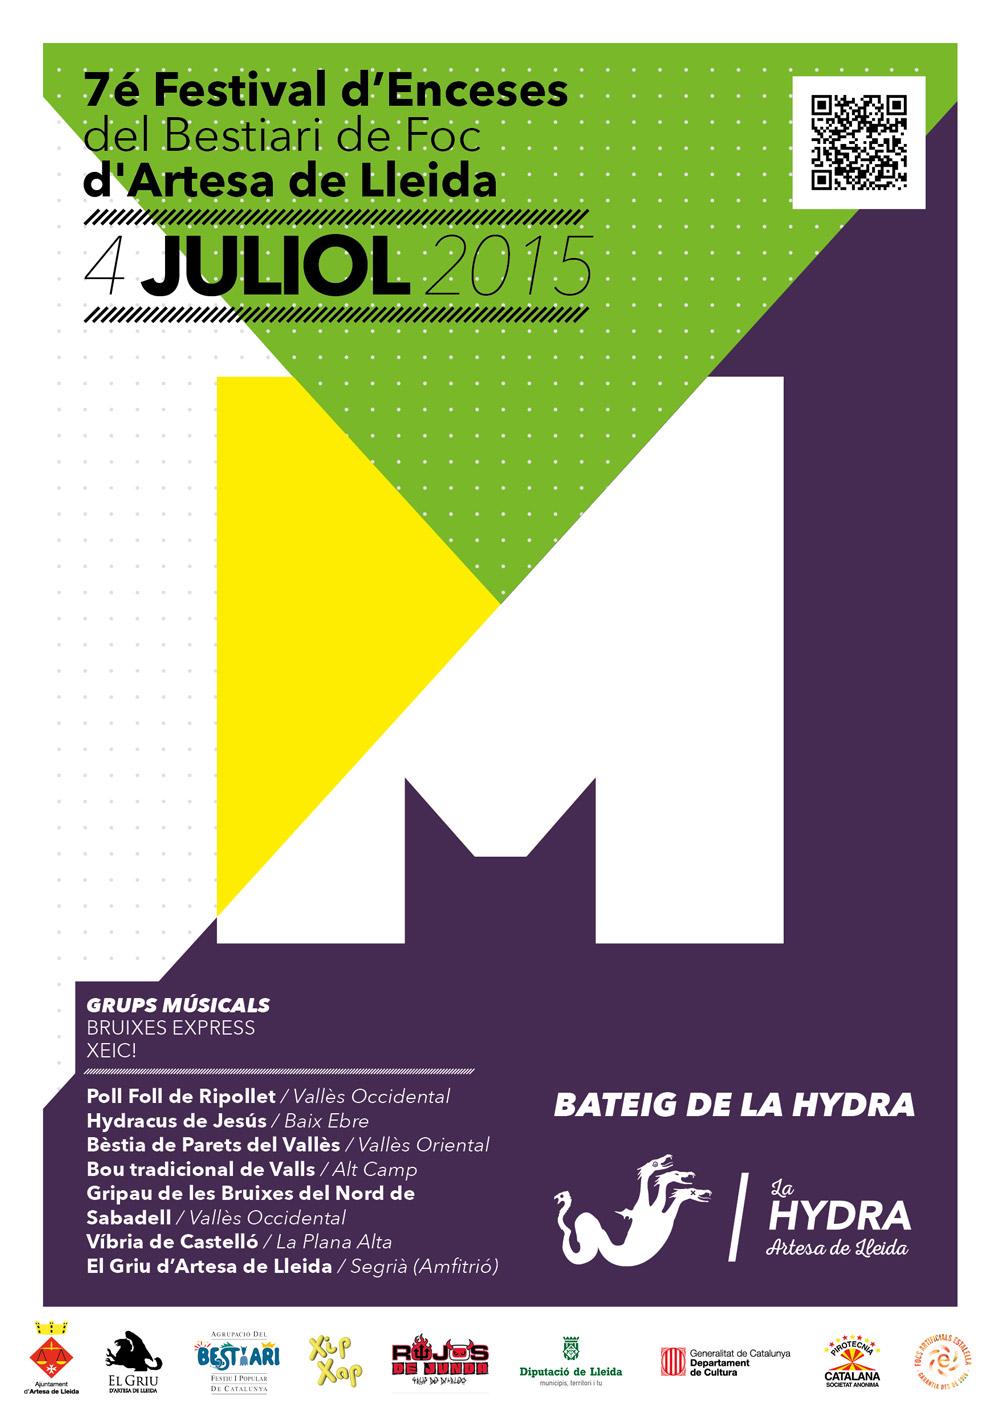 Diseño del Cartel del Griu Artesa de lleida. Disseny del cartell del Griu Artesa de Lleida.